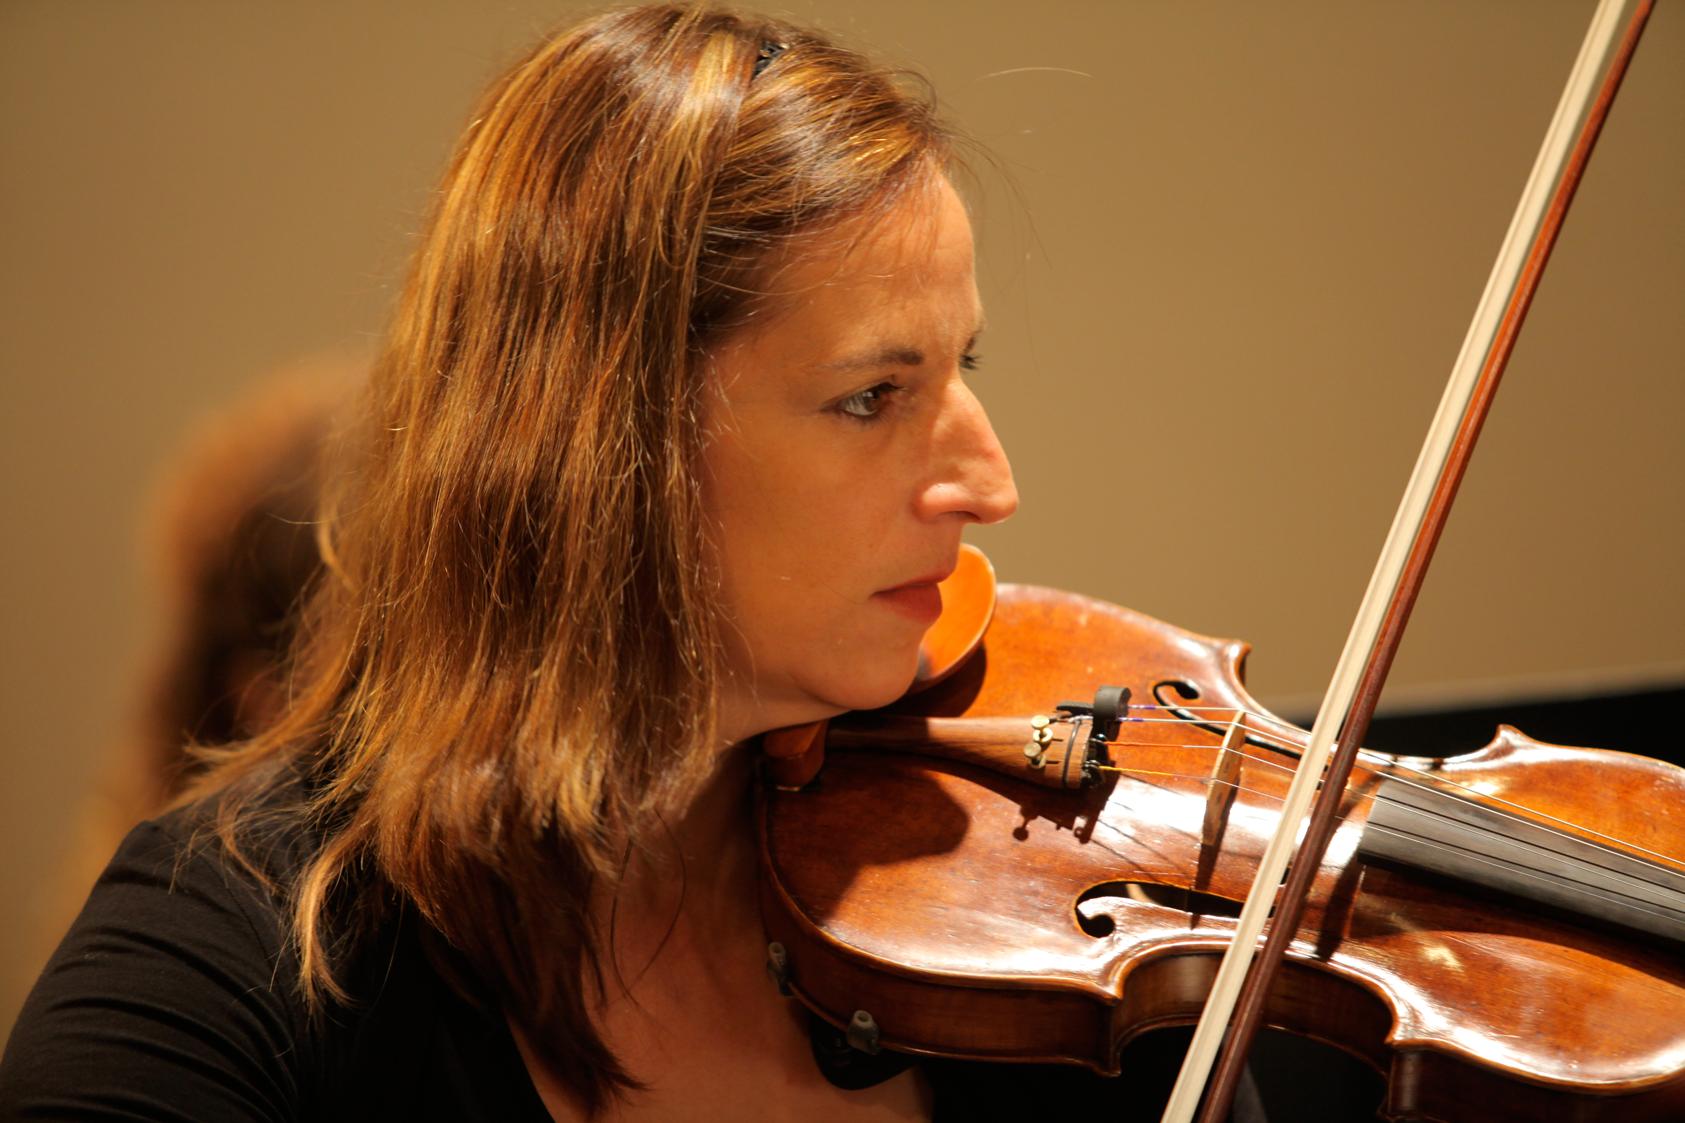 Veronika Ehrminger